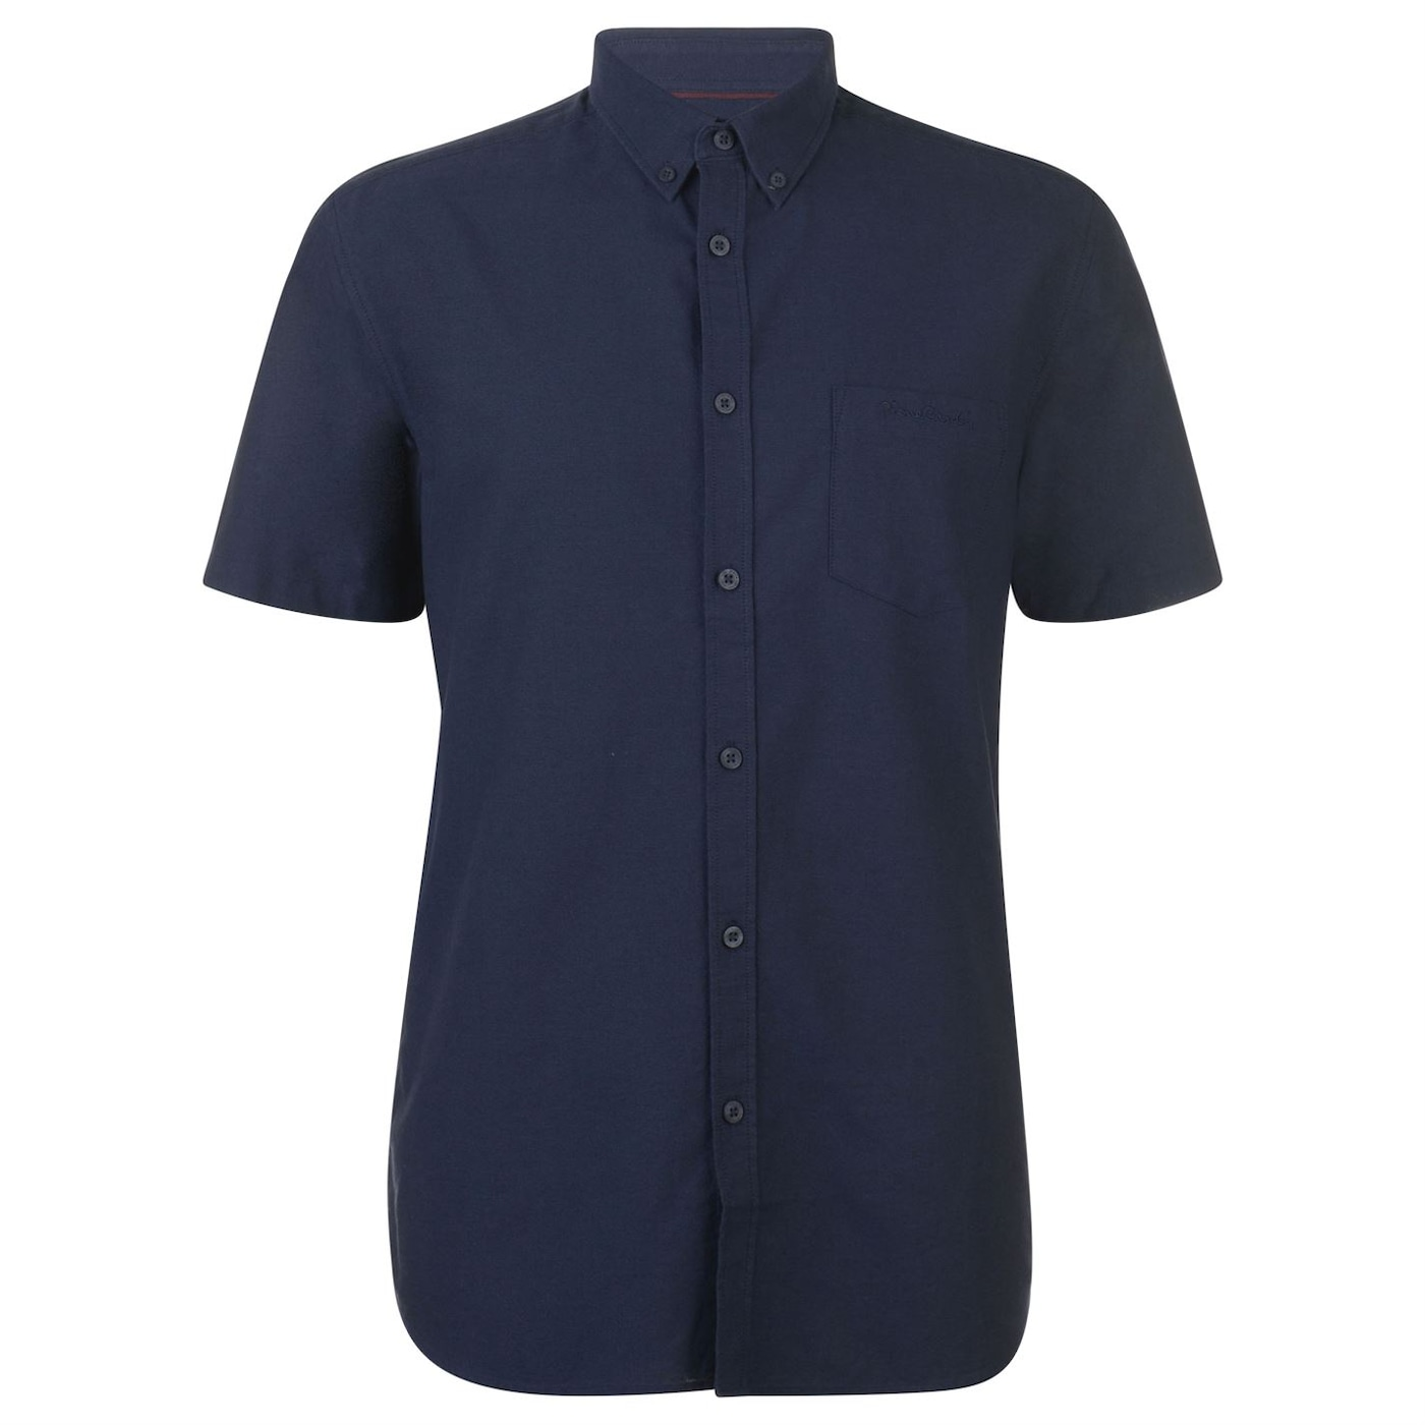 Pierre Cardin Short Sleeve Oxford Shirt Mens